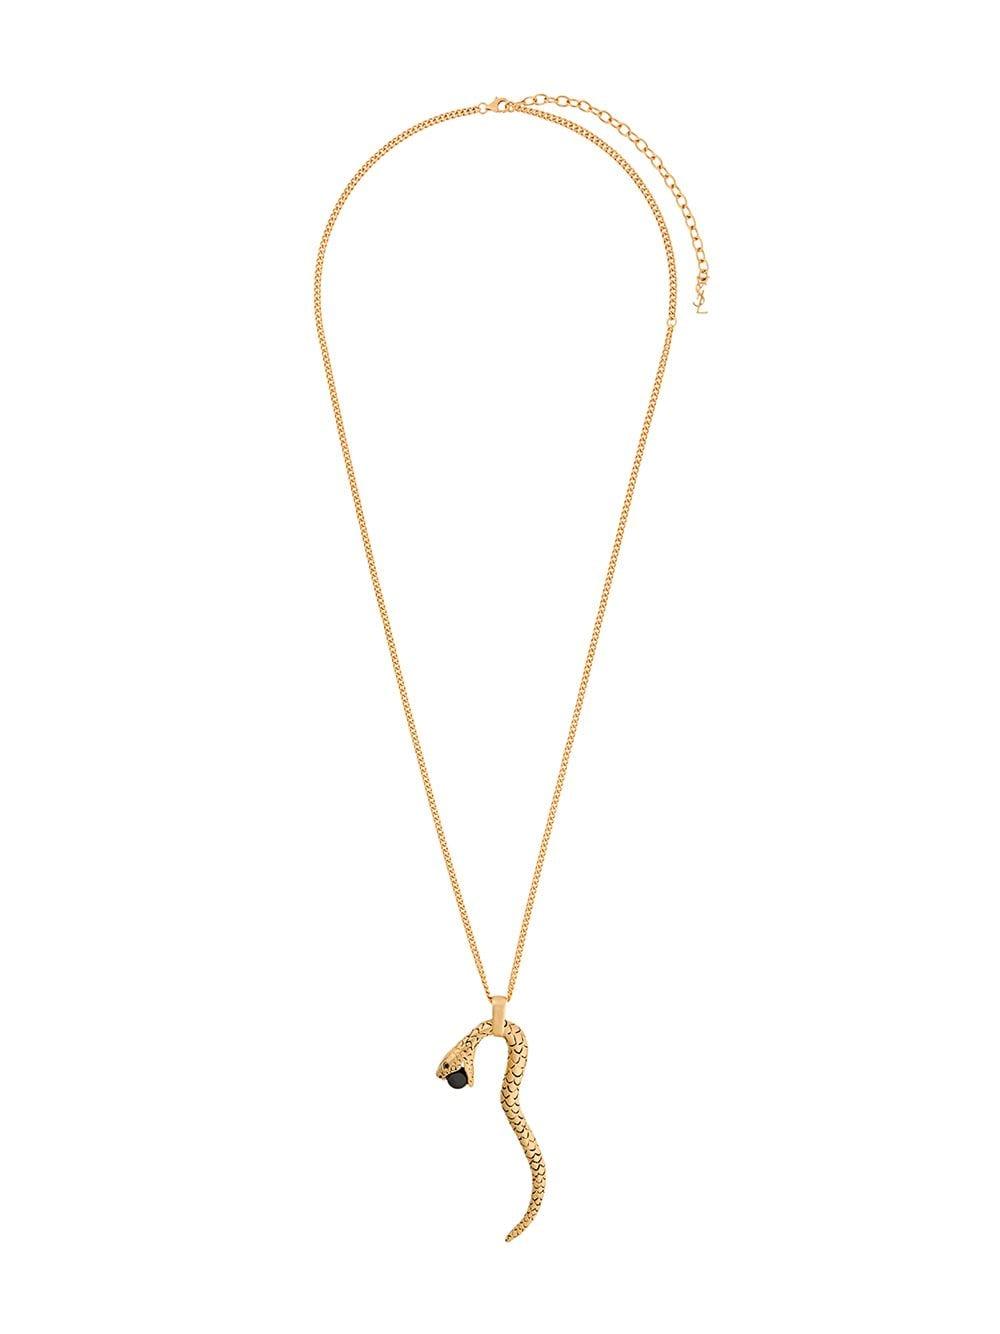 6c10e51397f Saint Laurent Snake pendant necklace $414 - Buy Online SS19 - Quick  Shipping, Price